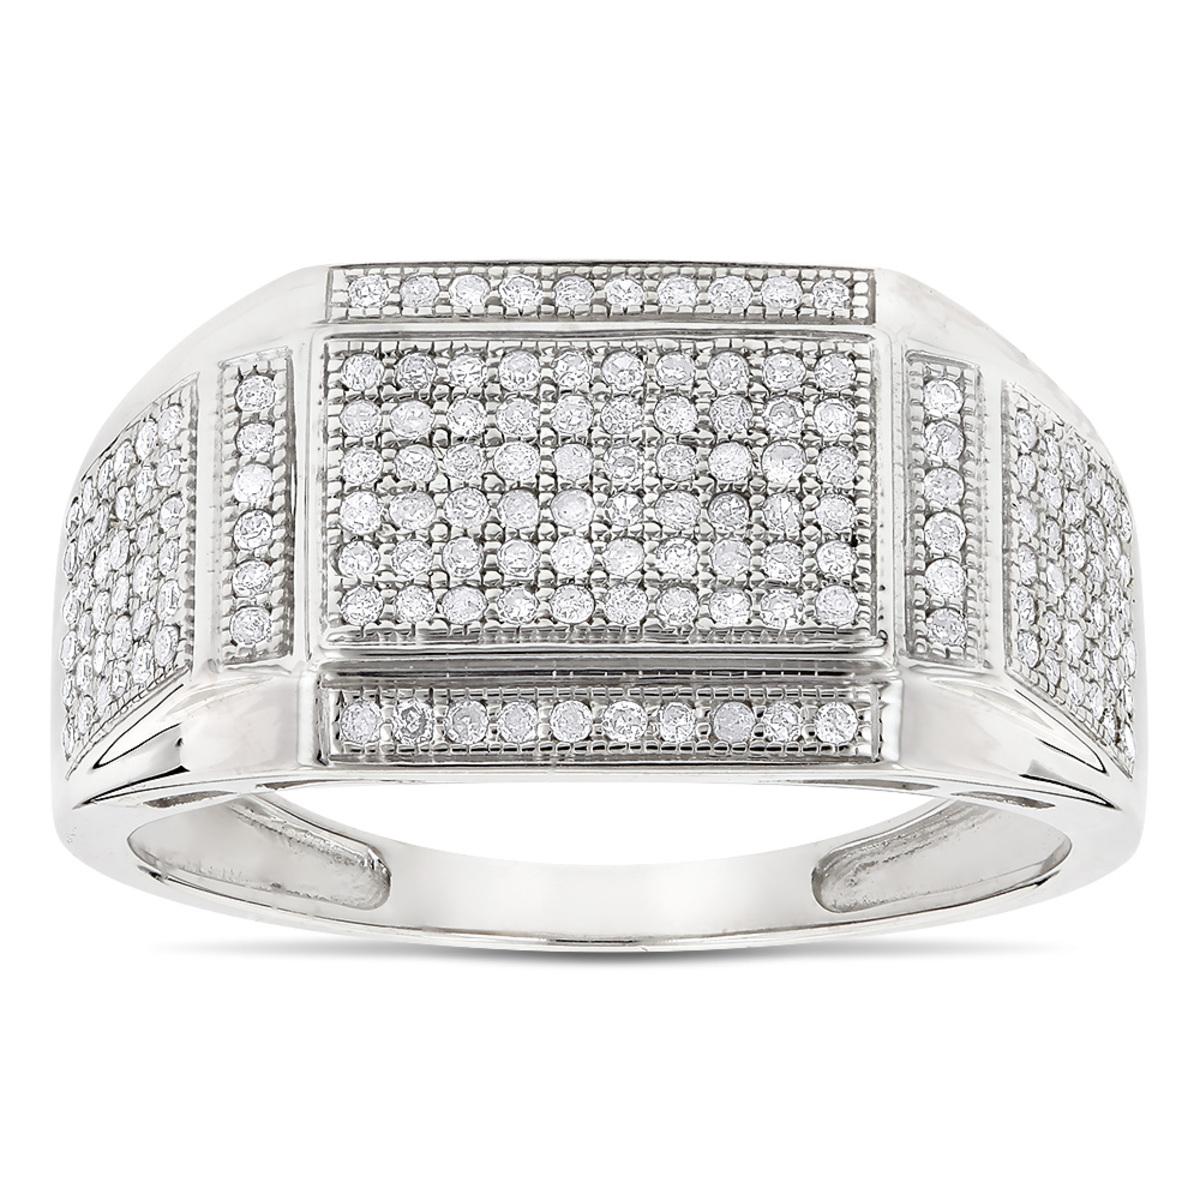 10K Gold Mens Diamond Ring 0.5ct